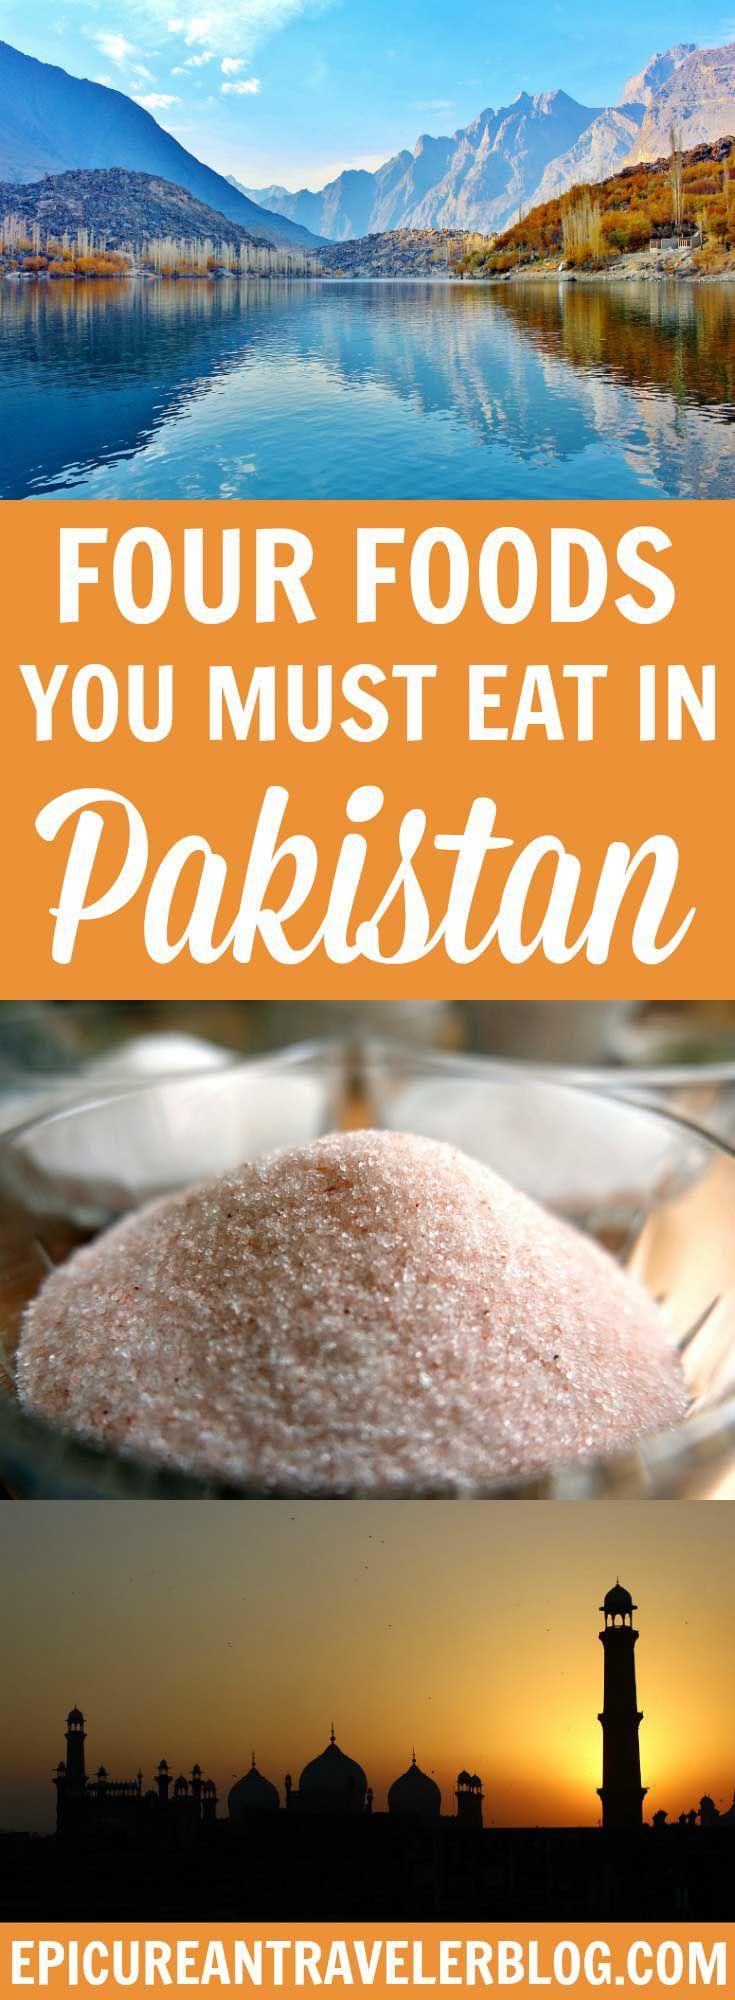 Four Pakistani Foods You Have To Taste - The Epicurean Traveler